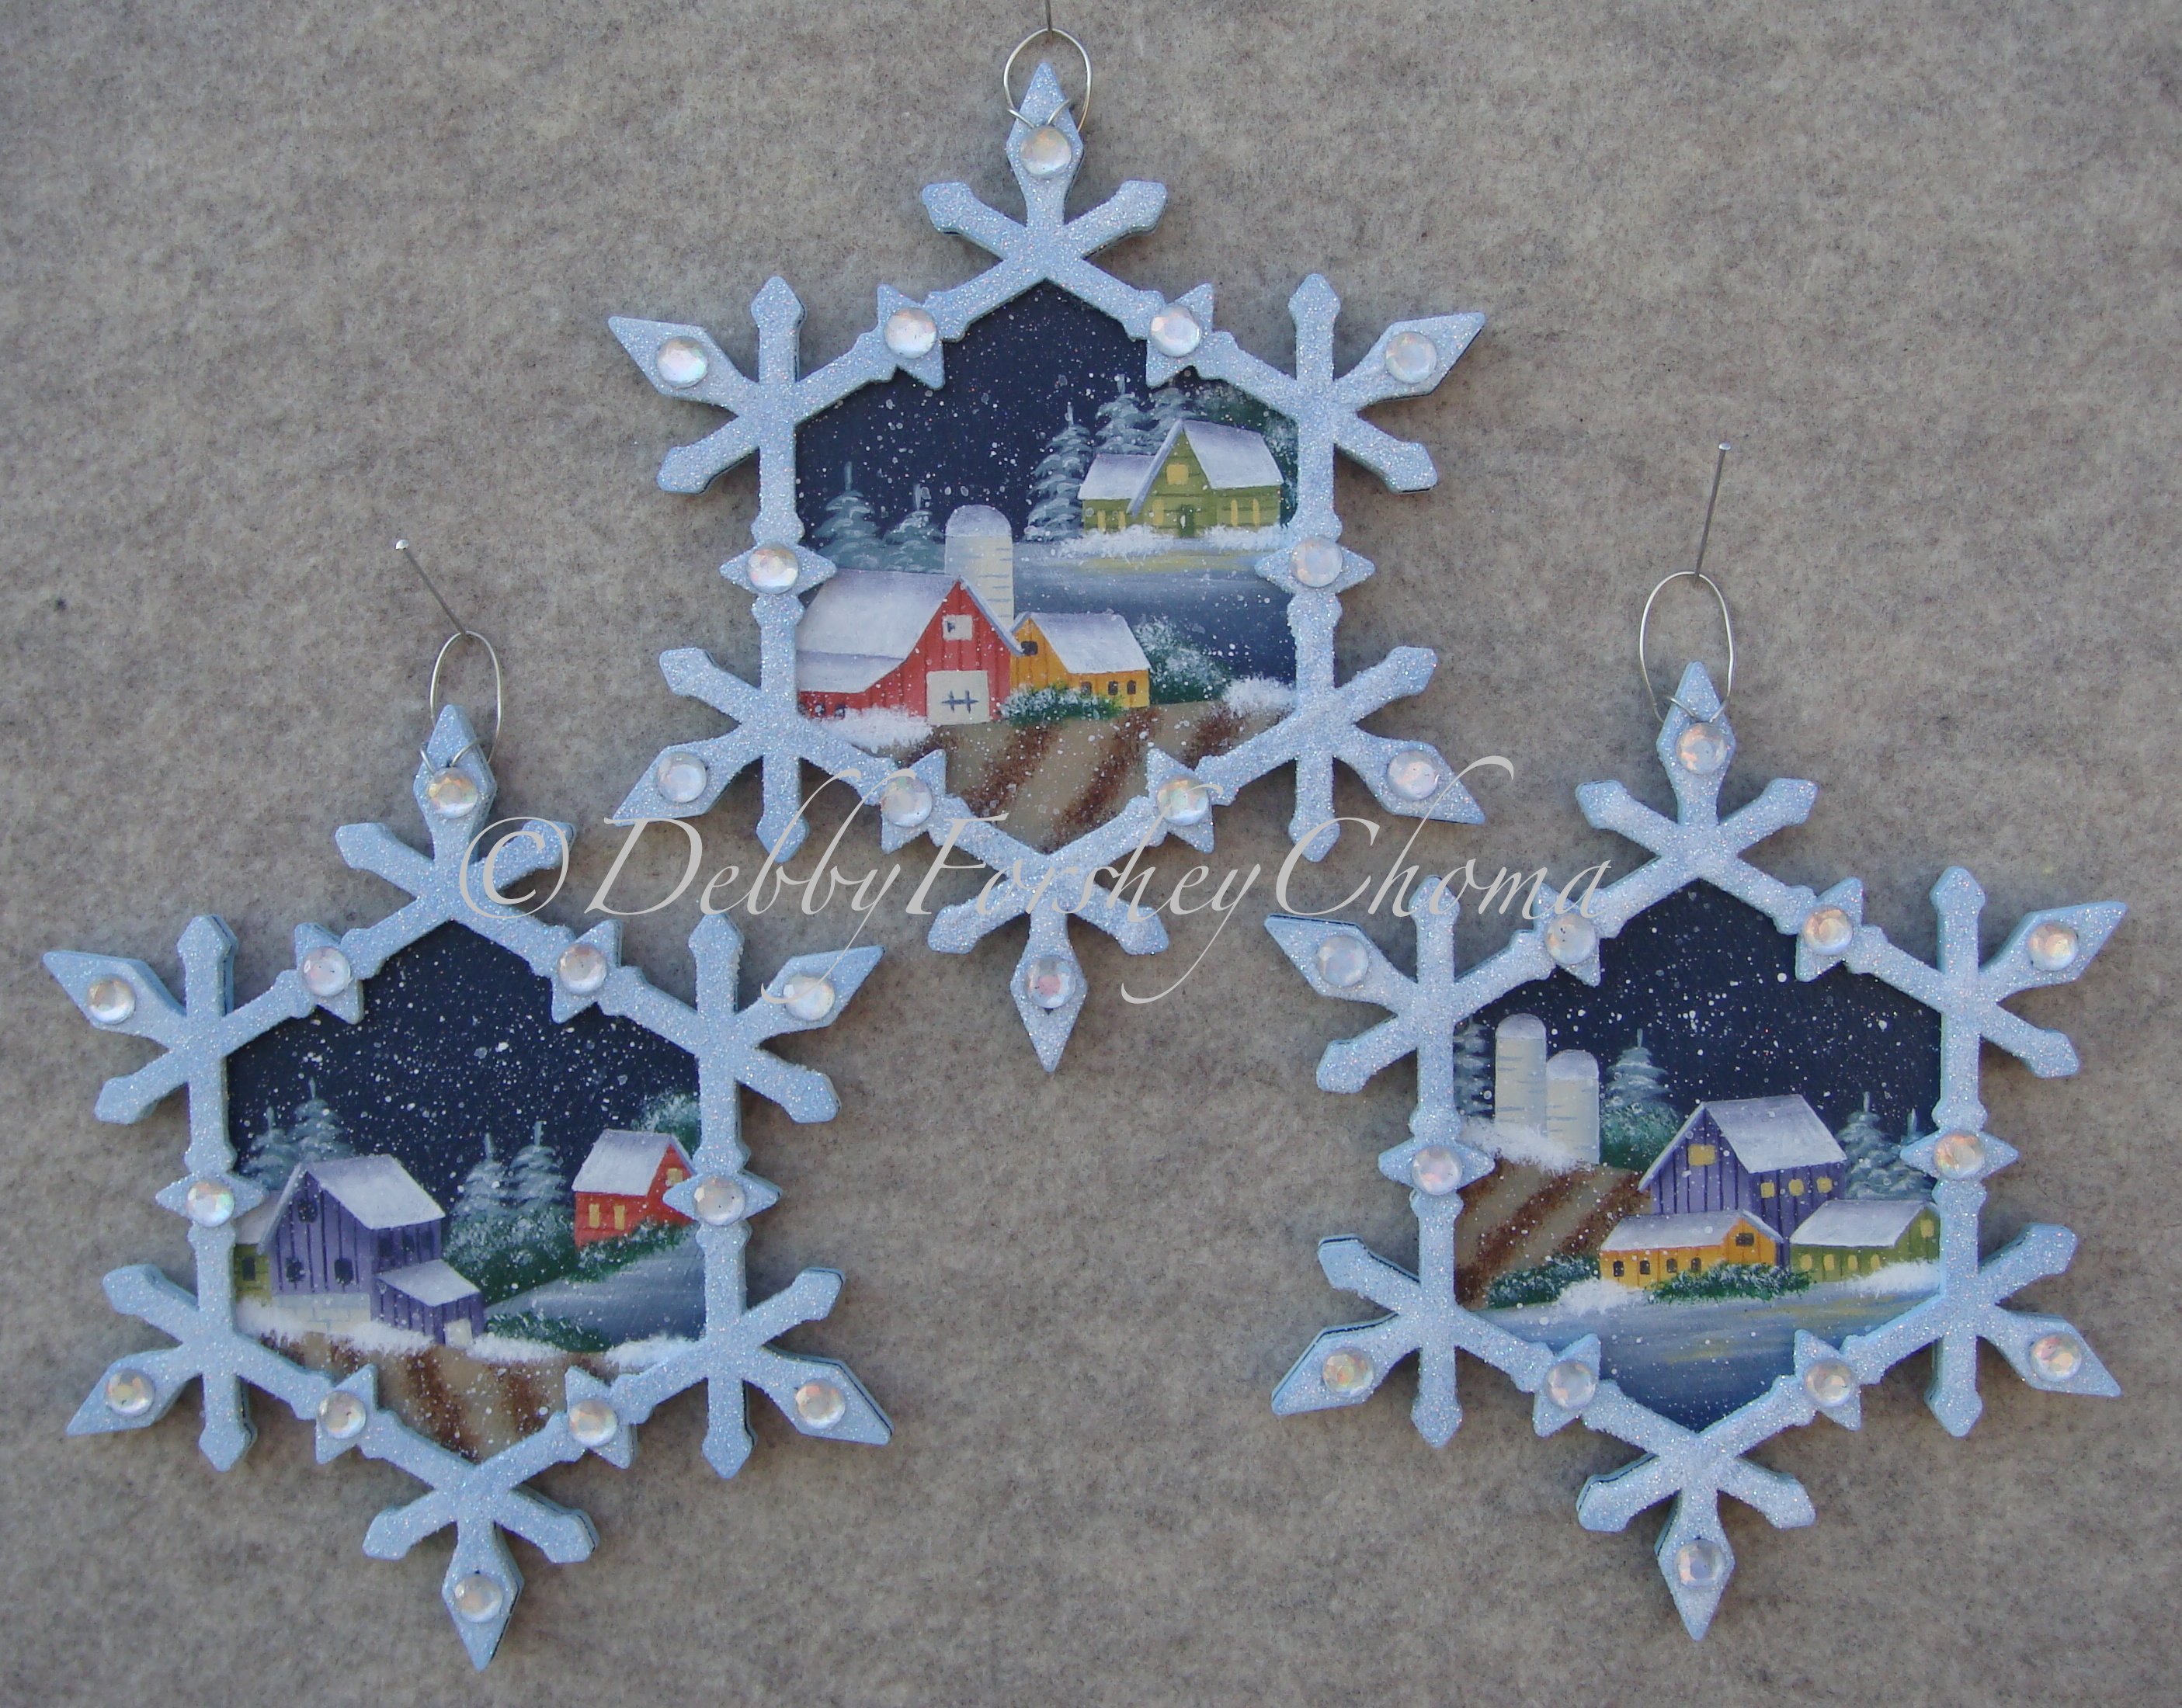 Snowflake Jewels - E-Packet - Debby Forshey-Choma